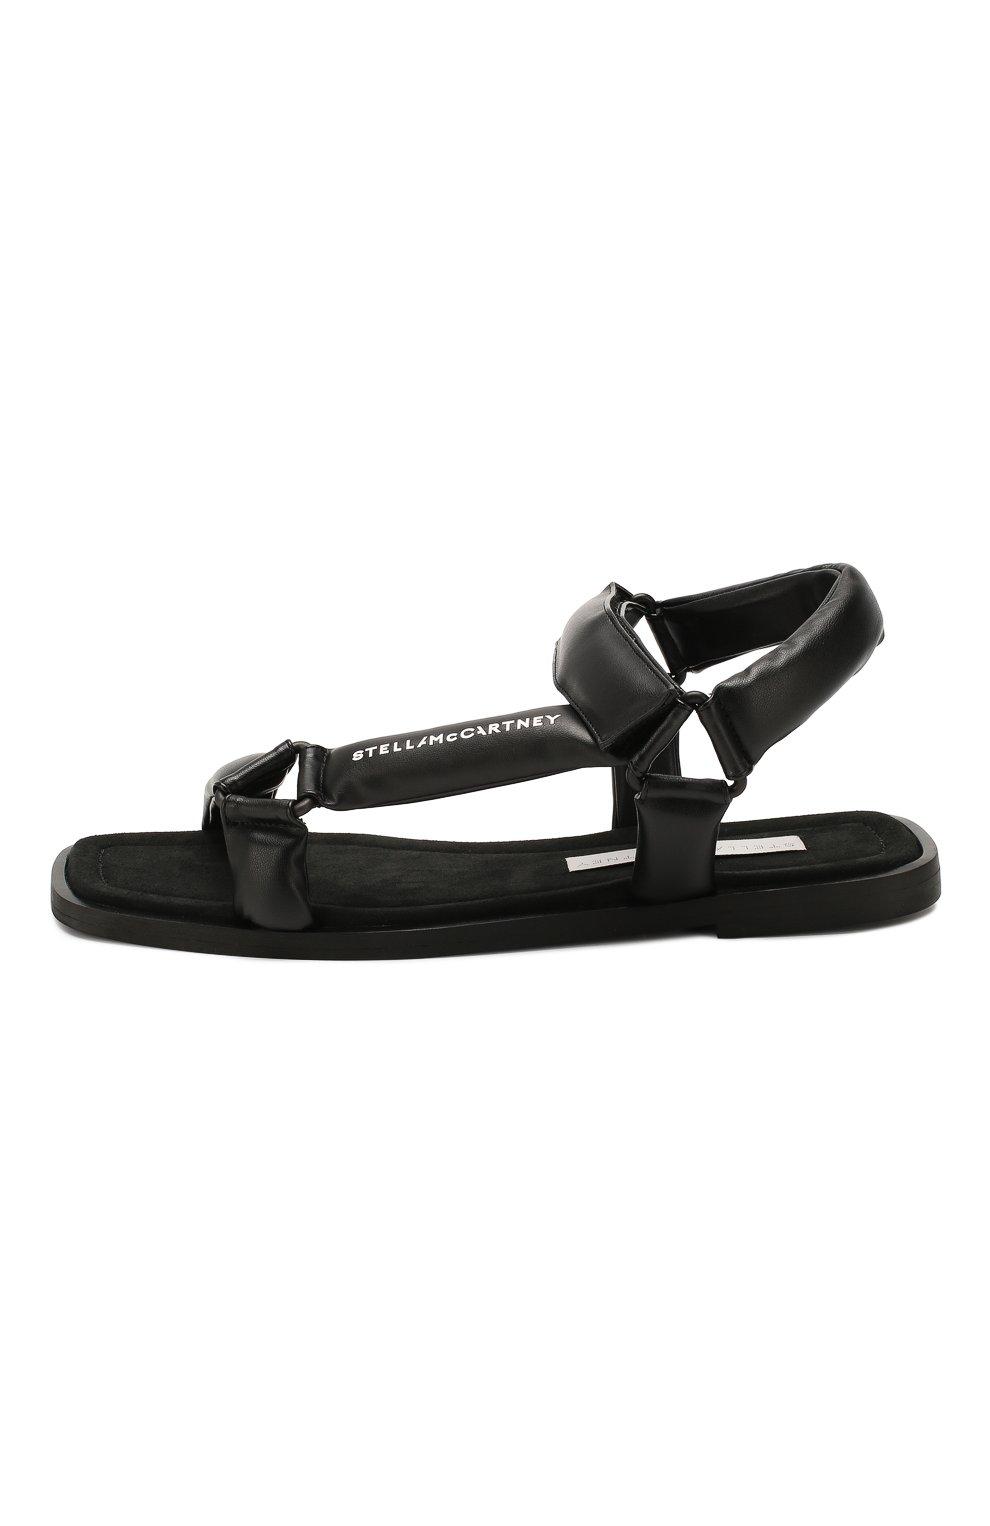 Женские сандалии STELLA MCCARTNEY черного цвета, арт. 800181/N0096 | Фото 3